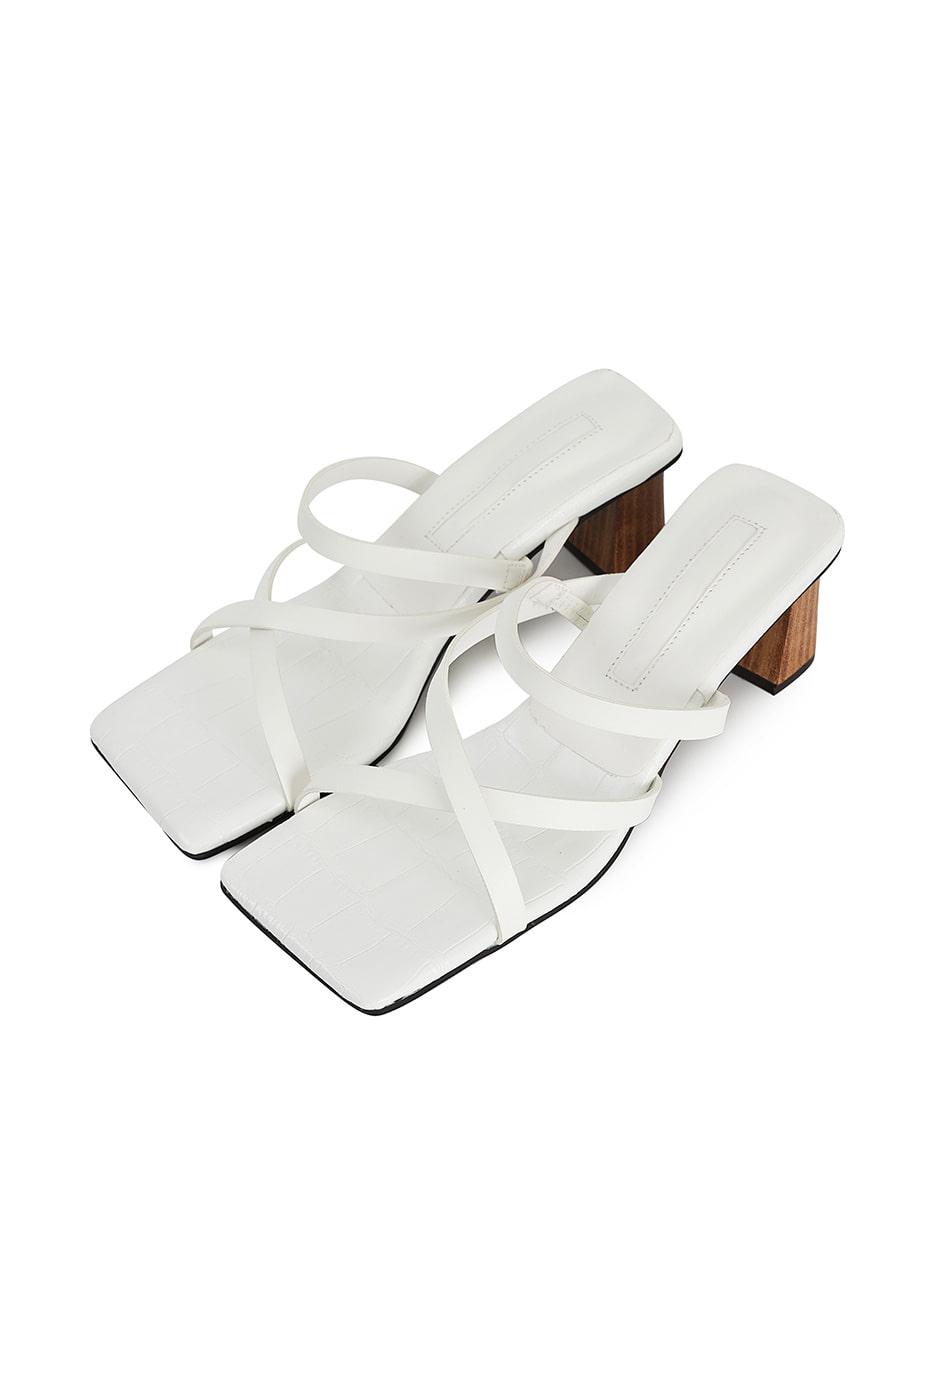 Scotch animal pattern middle-heel sandals